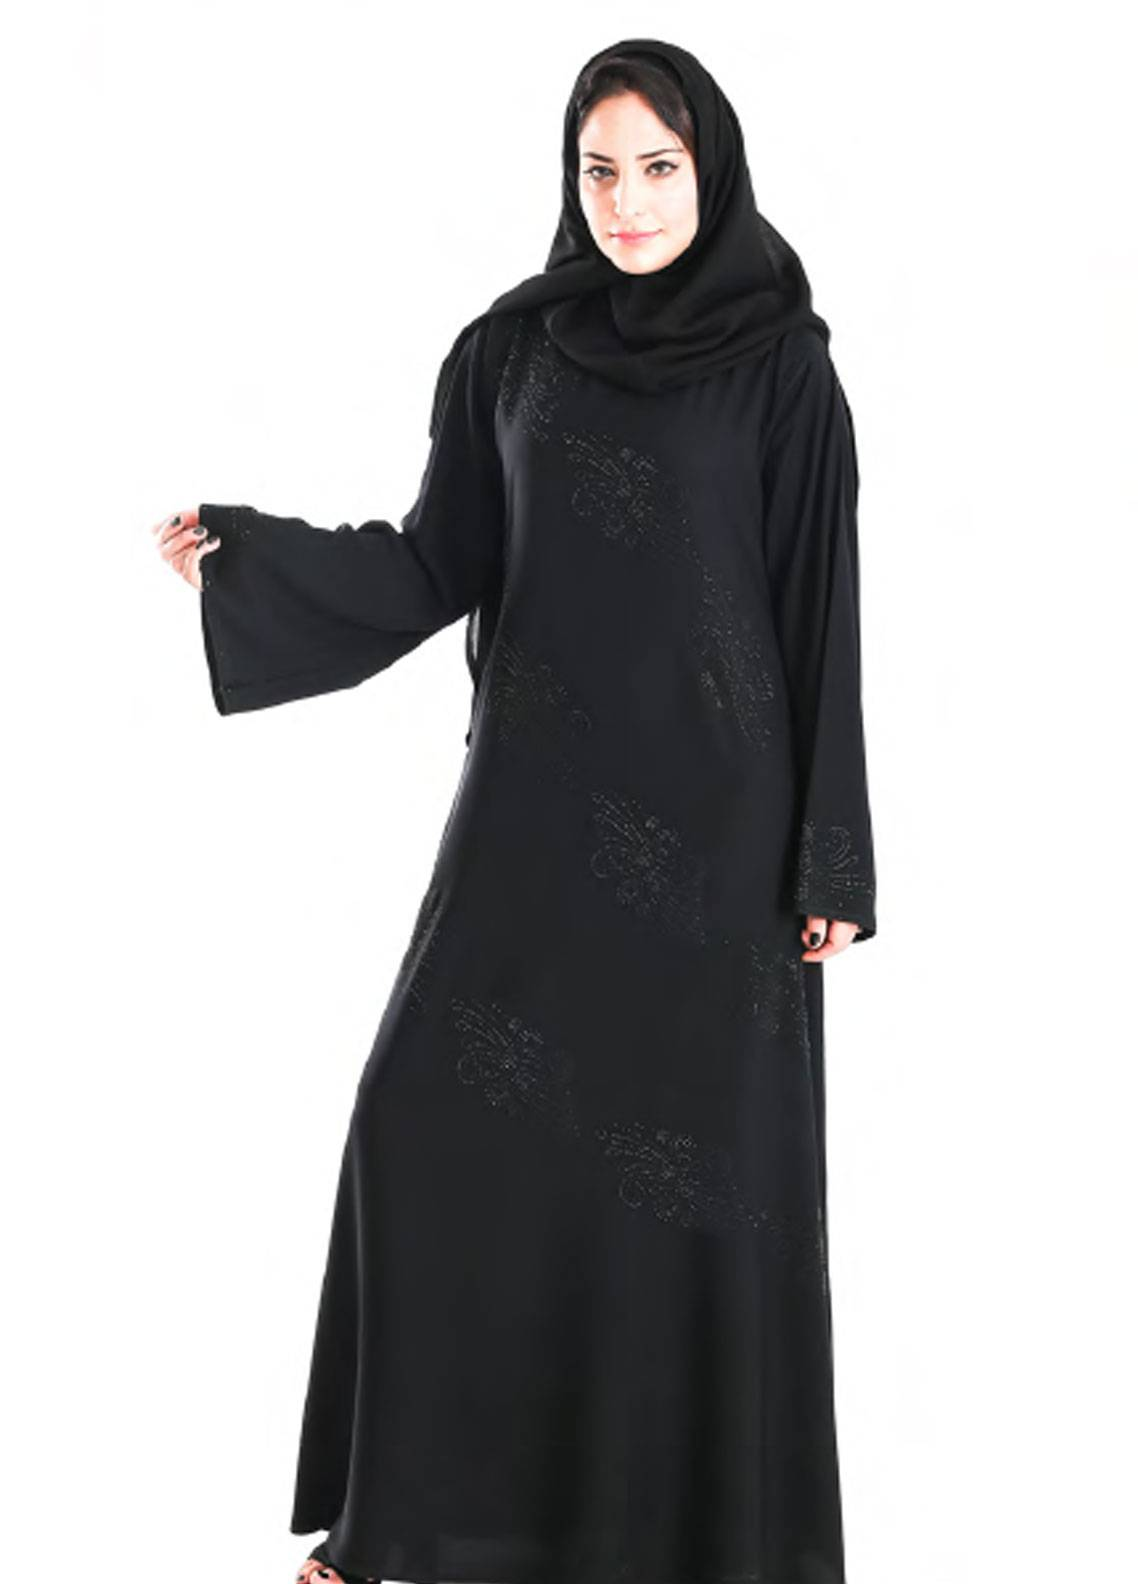 Hijab ul Hareem Pullover  Stitched Abaya 0120-C-950